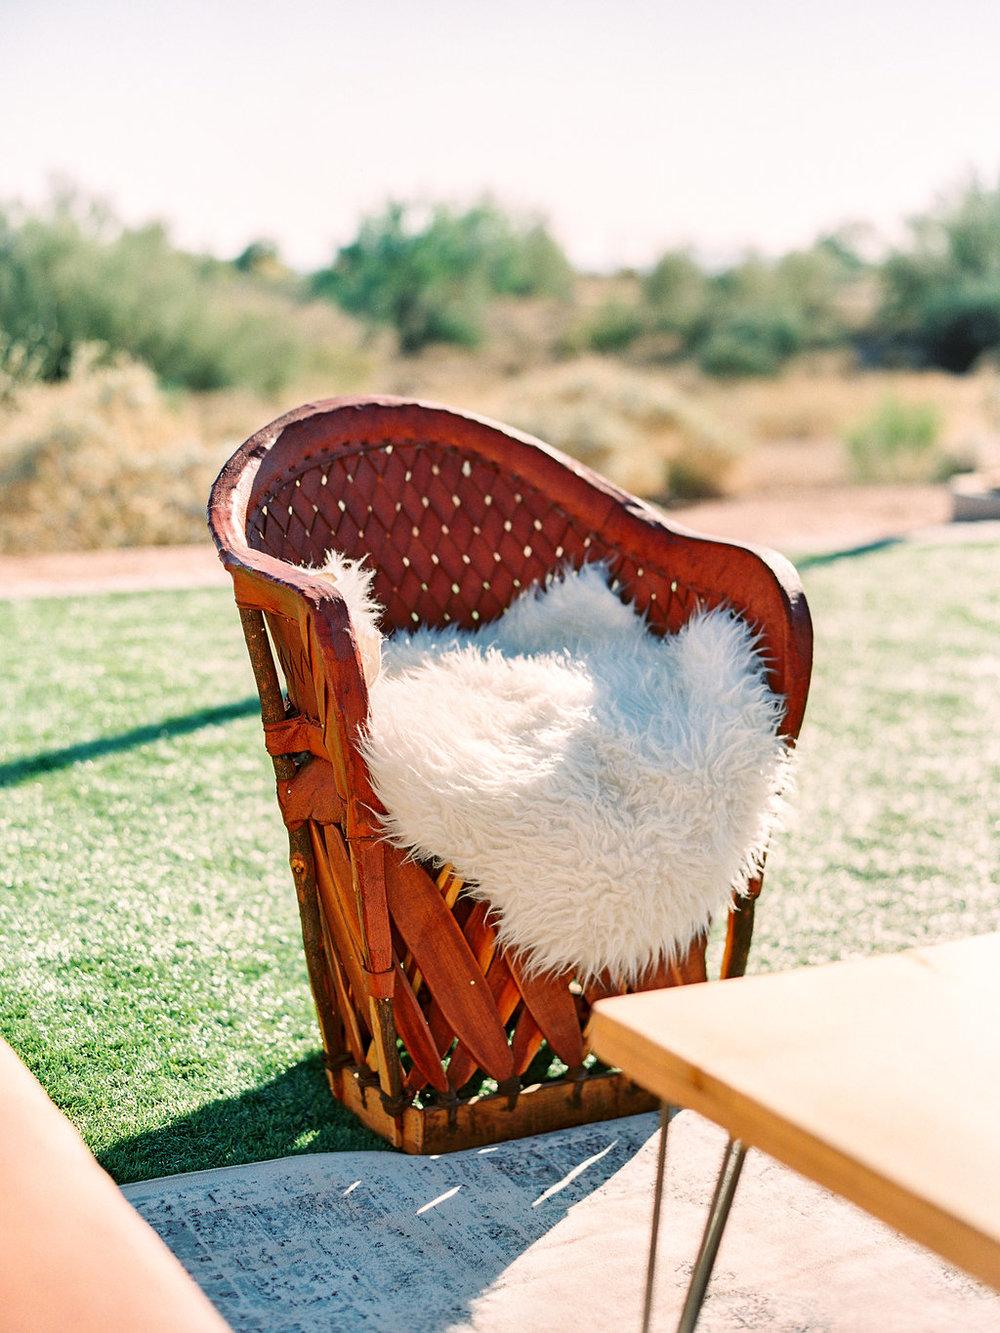 The Dreamiest Desert Inspired Wedding featured on The Perfect Palette: Kandice & Bobby- Konsider It Done- AZ Arizona Wedding & Event Planner, Designer, Coordinator Planning in Scottsdale, Phoenix, Paradise Valley, Tempe, Gilbert, Mesa, Chandler, Tucson, Sedona